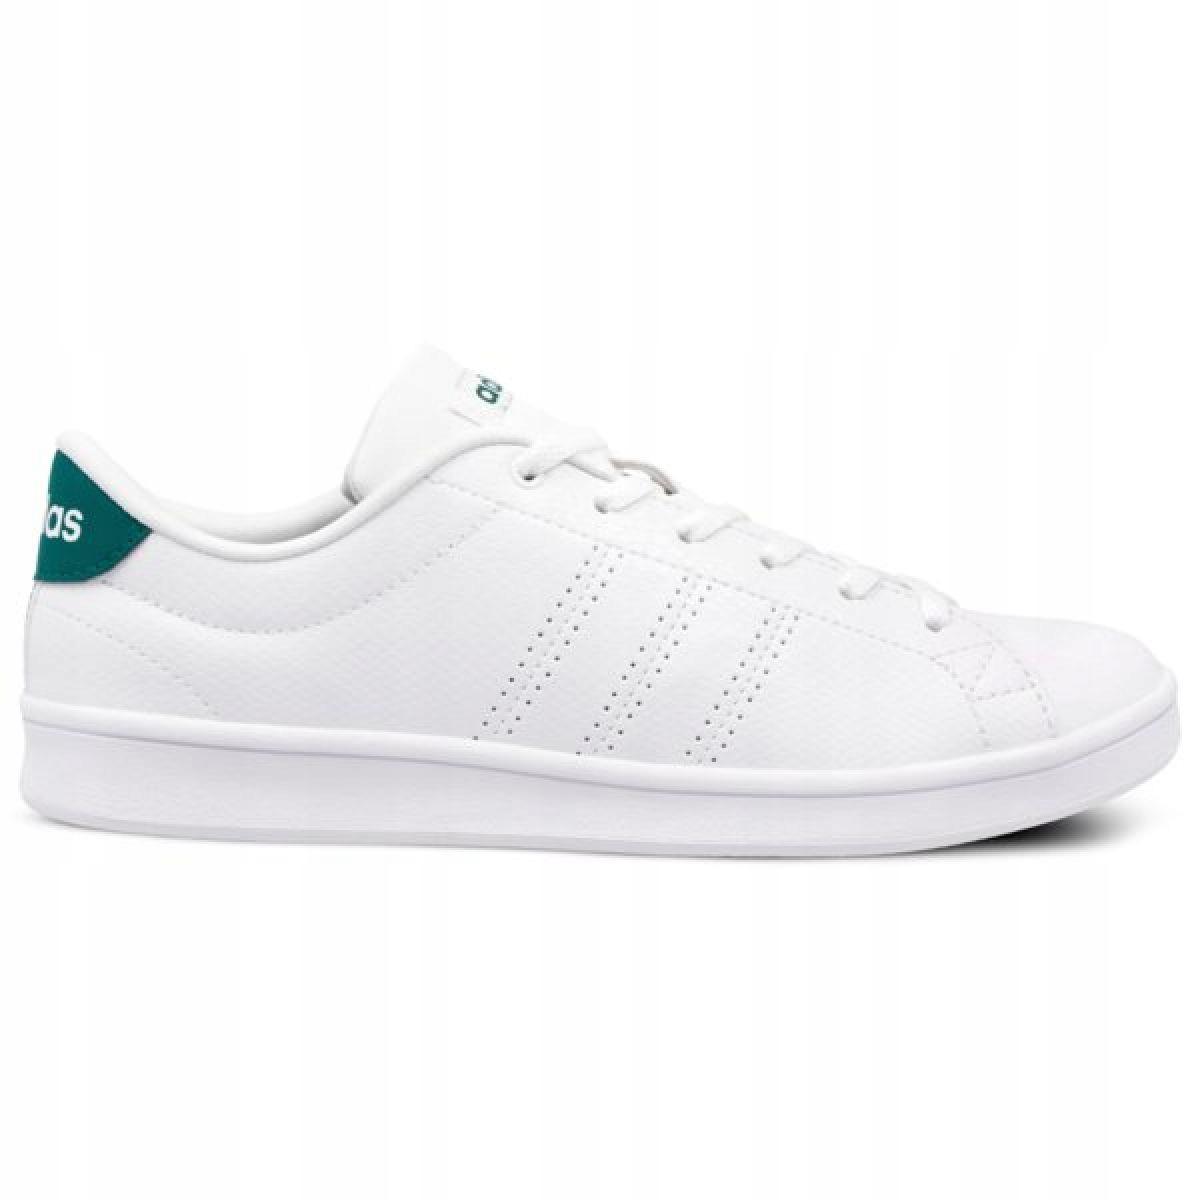 Adidas Buty Damskie Advantage Clean Qt Marki Online Białe